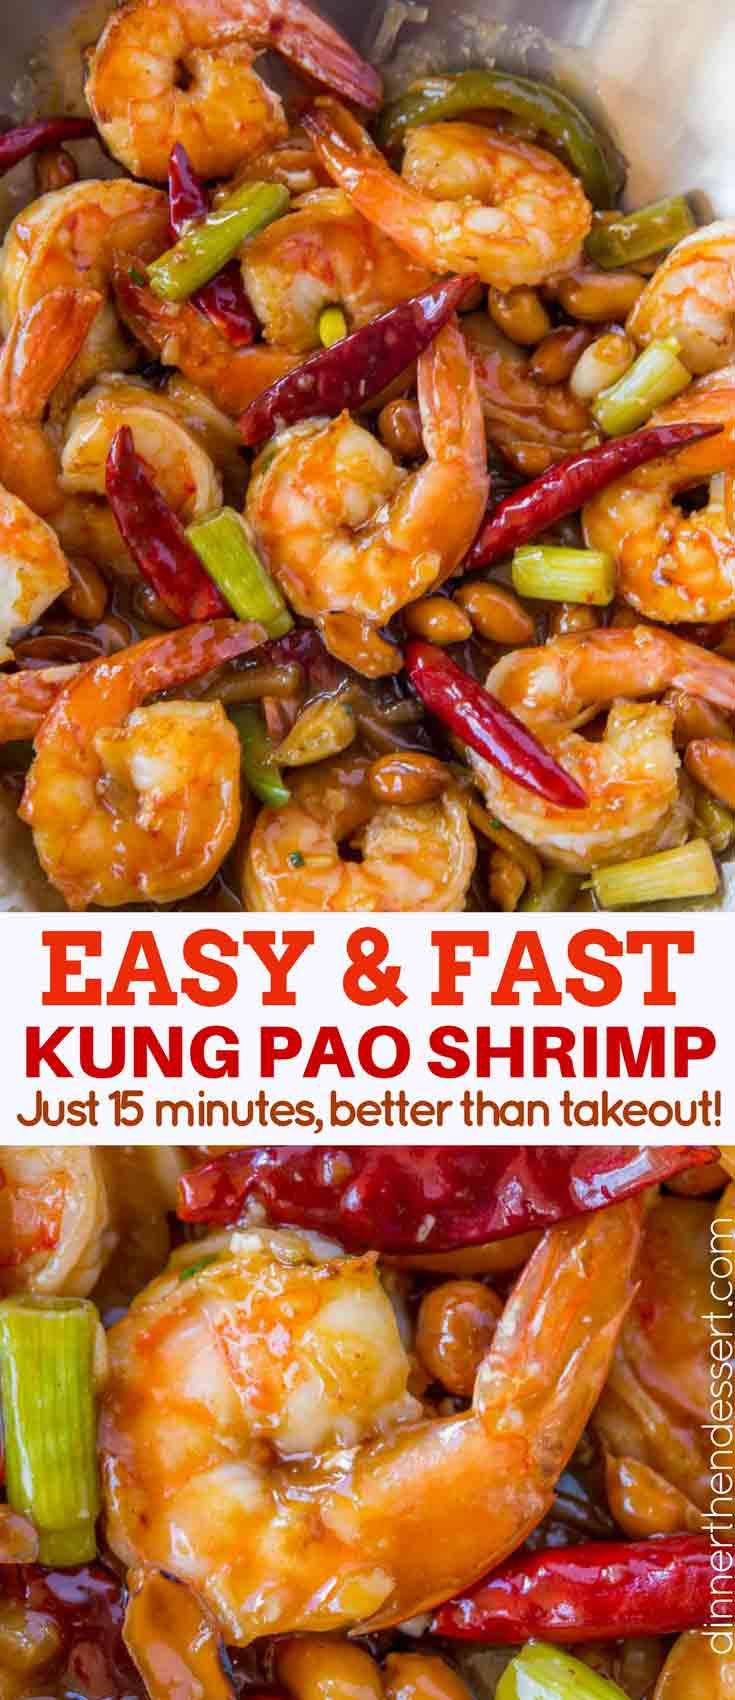 Kung pao shrimp dinner then dessert quick kung pao shrimp chinese kung pao shrimp forumfinder Gallery